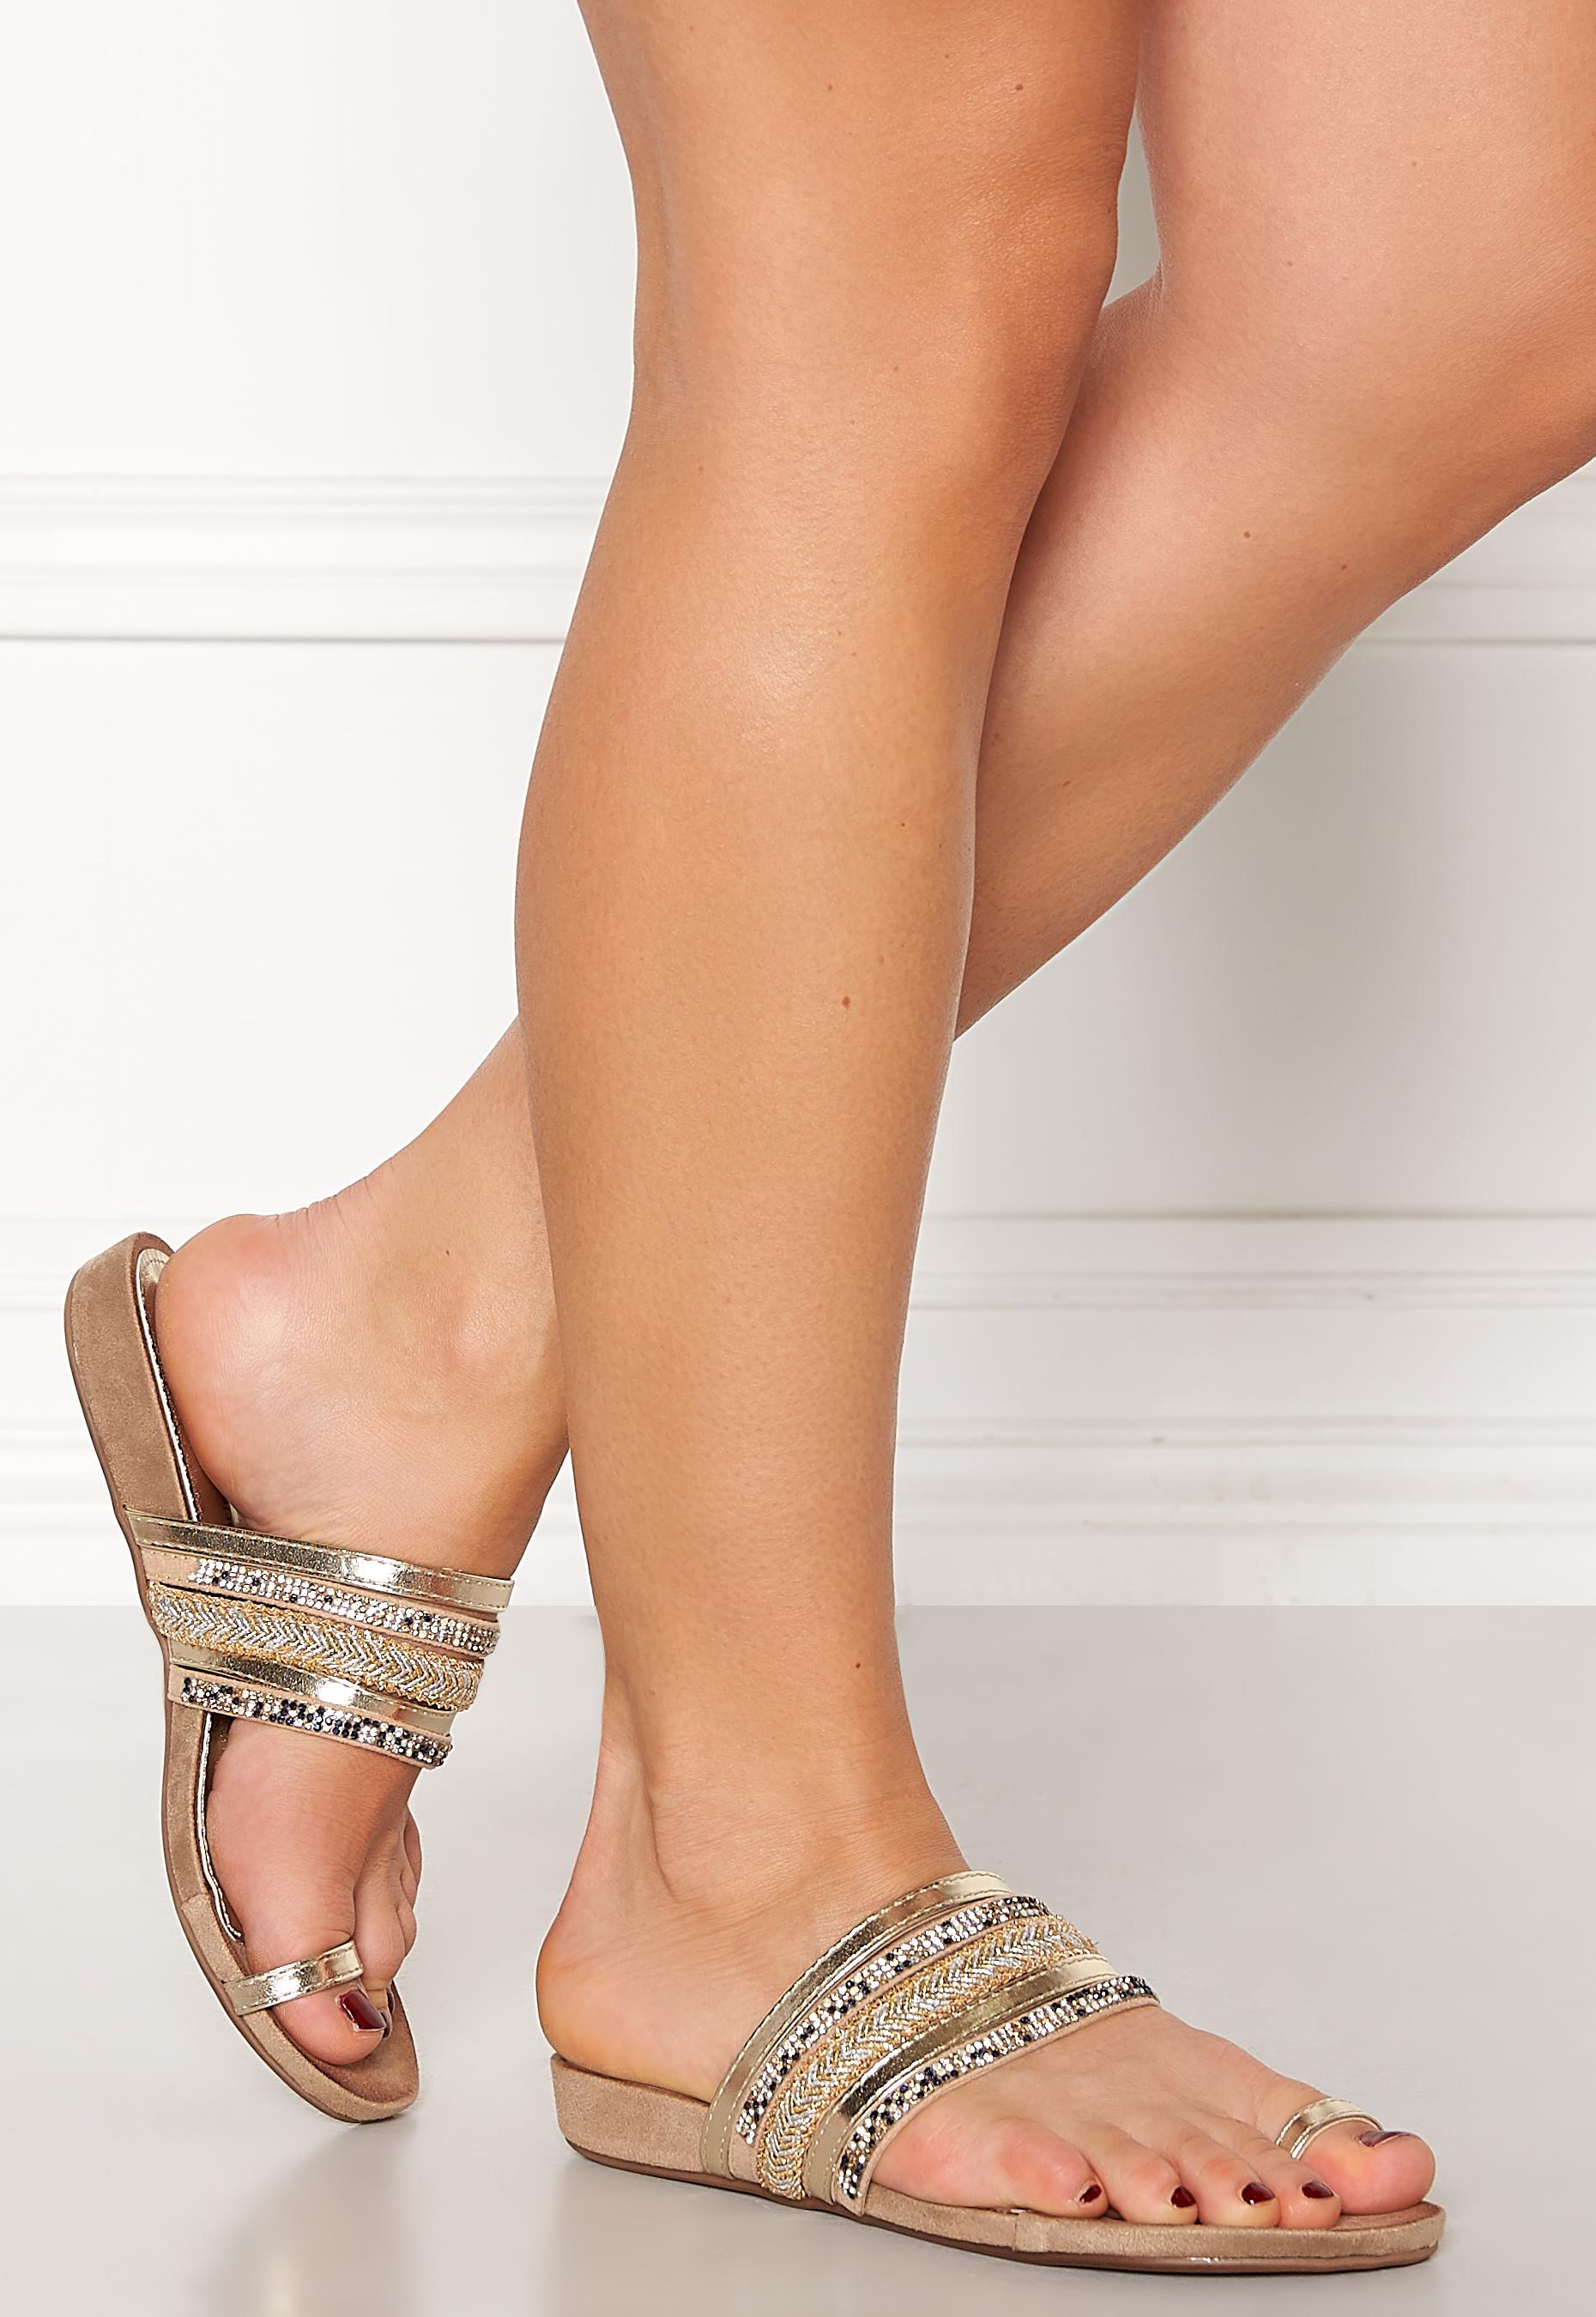 Toe Sandals Platino - Bubbleroom